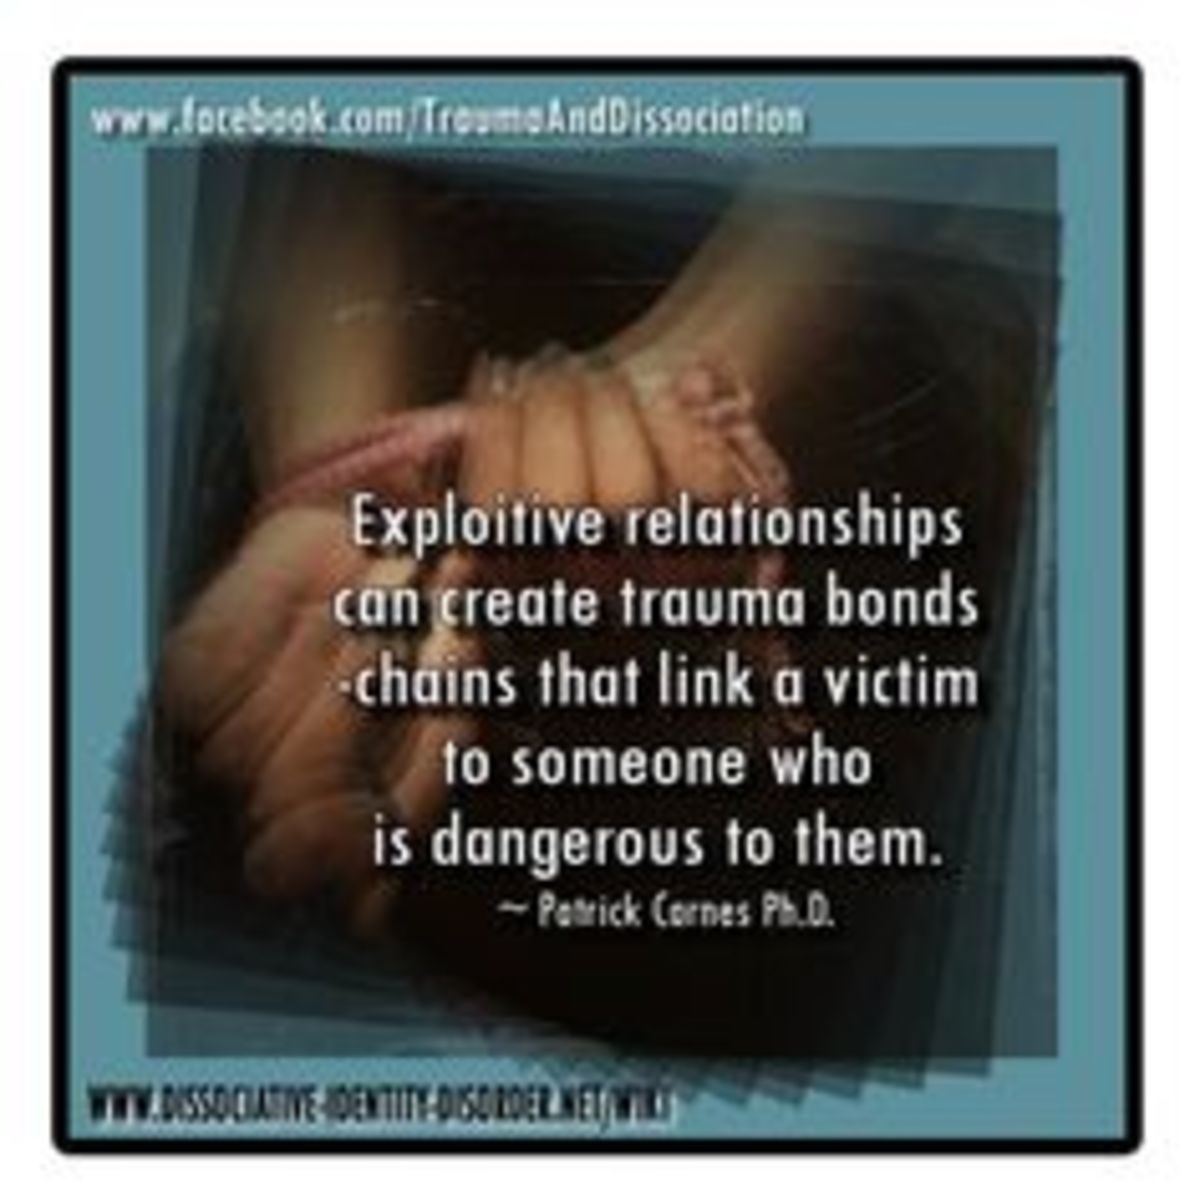 Exploitive relationships